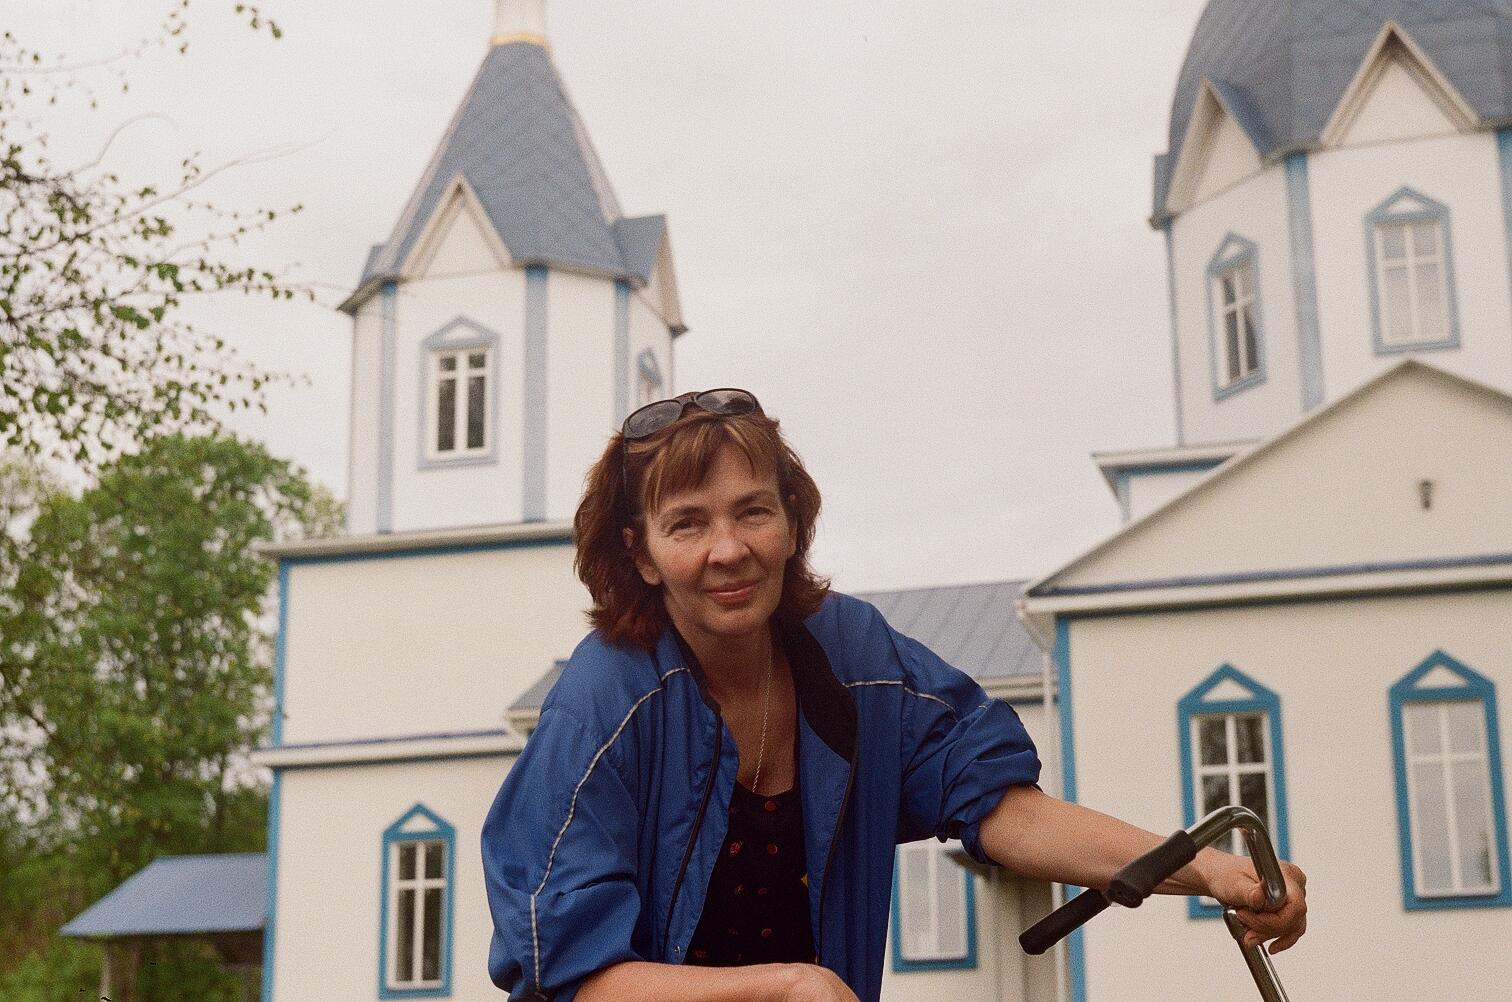 Анна Носова на фоне деревенской церкви